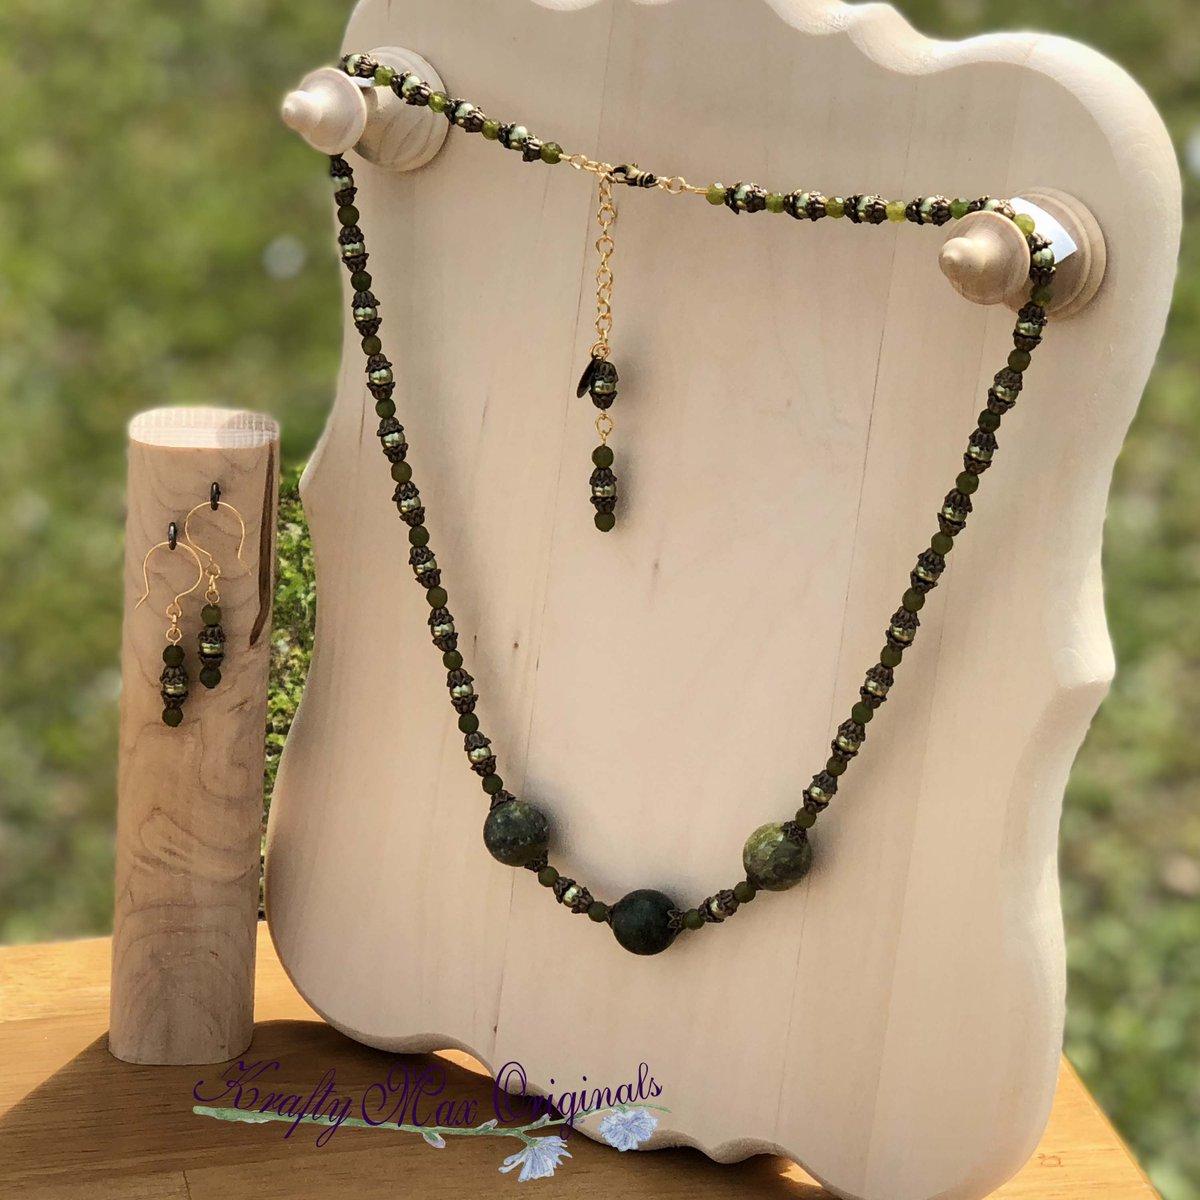 Green Gemstone and Swarovski Pearls Necklace Set $38  #handmade #jewelry #supporthandmade #buyhandmade #handmadelove #jewelrydesigner #jewelryart #uniquejewelry #handcrafted #kraftymax #kmax